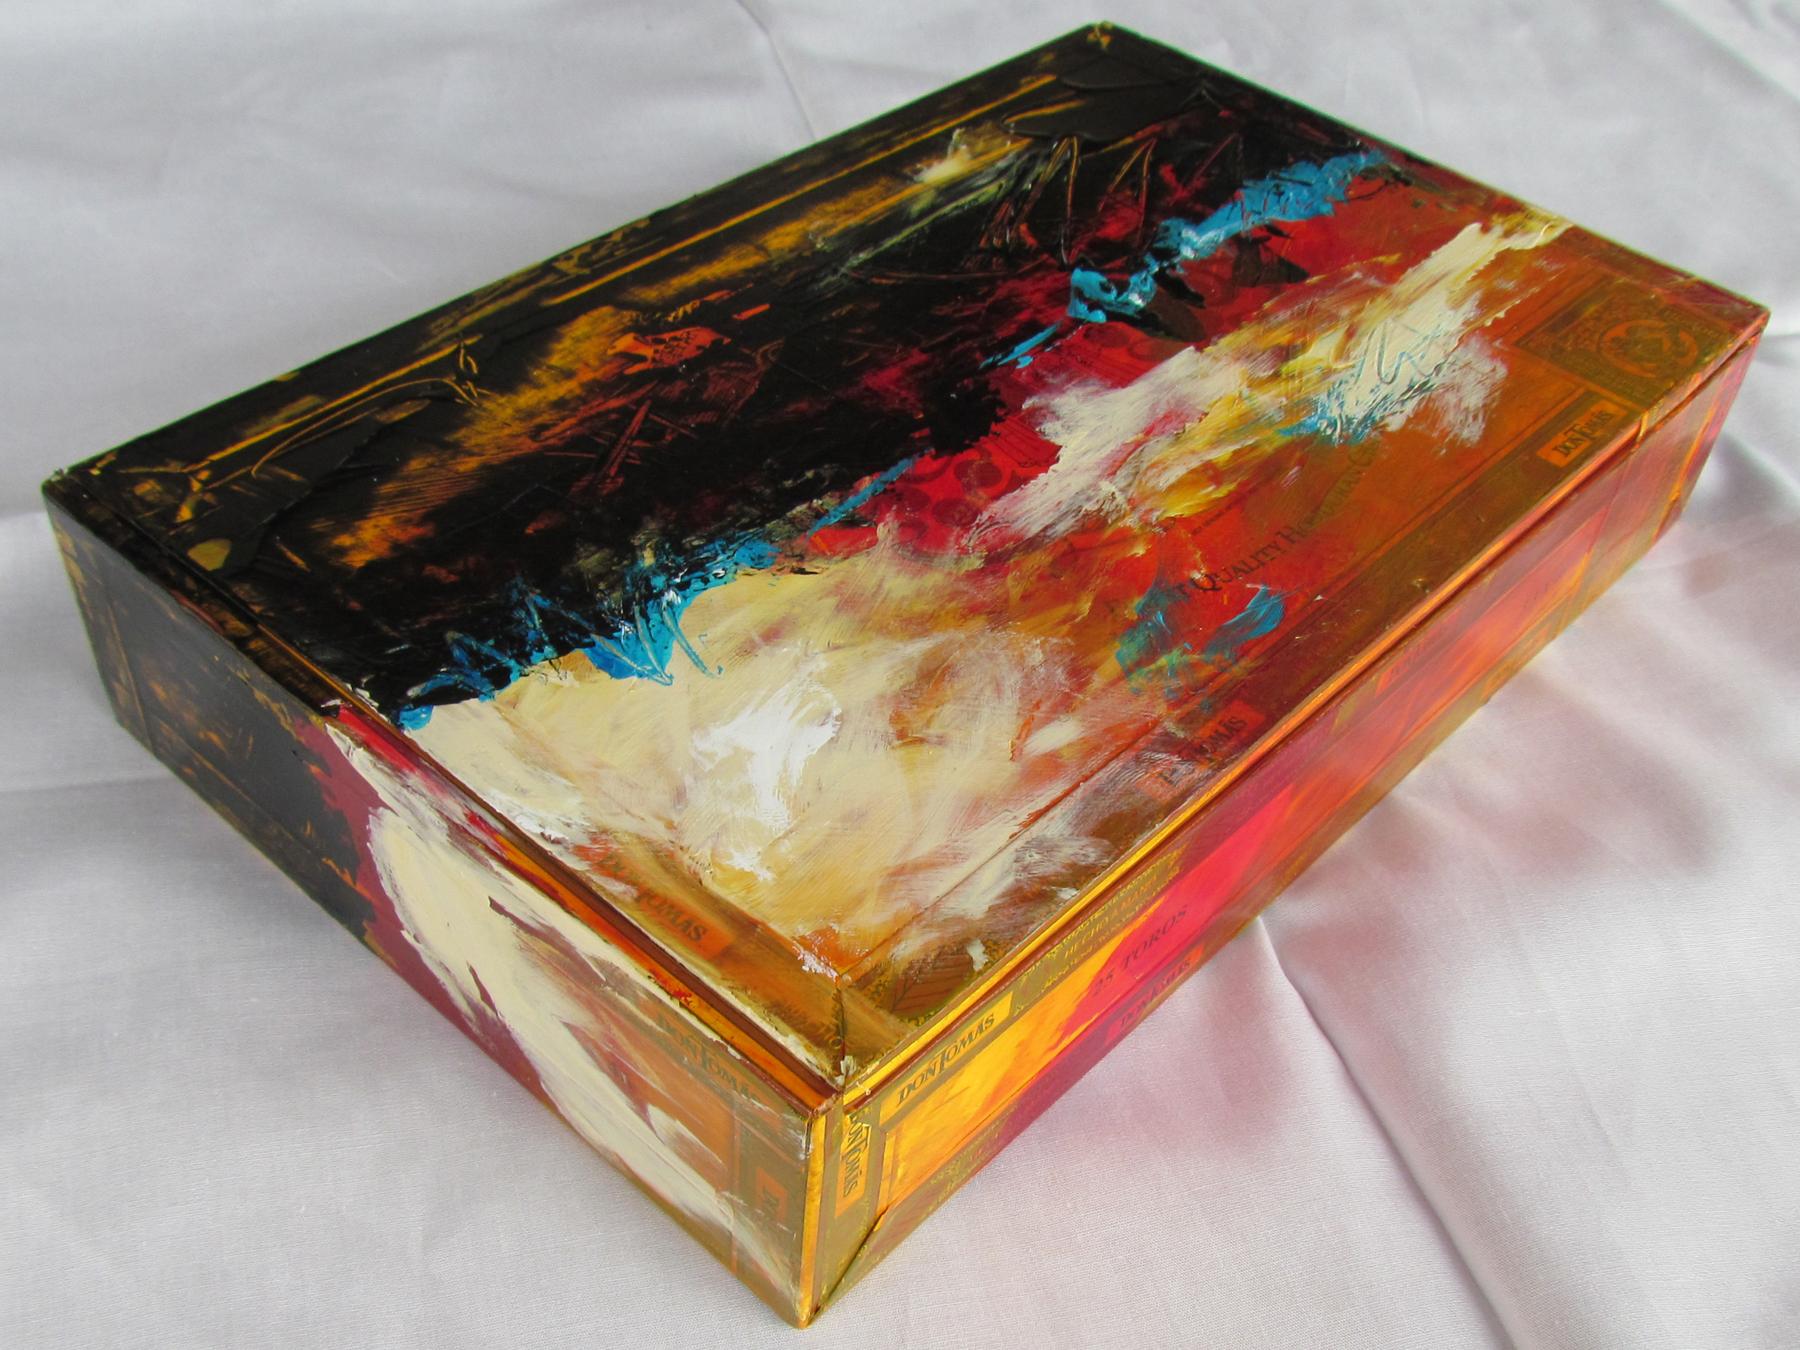 TsunamiAftermath(CigarBoxDetail)1800